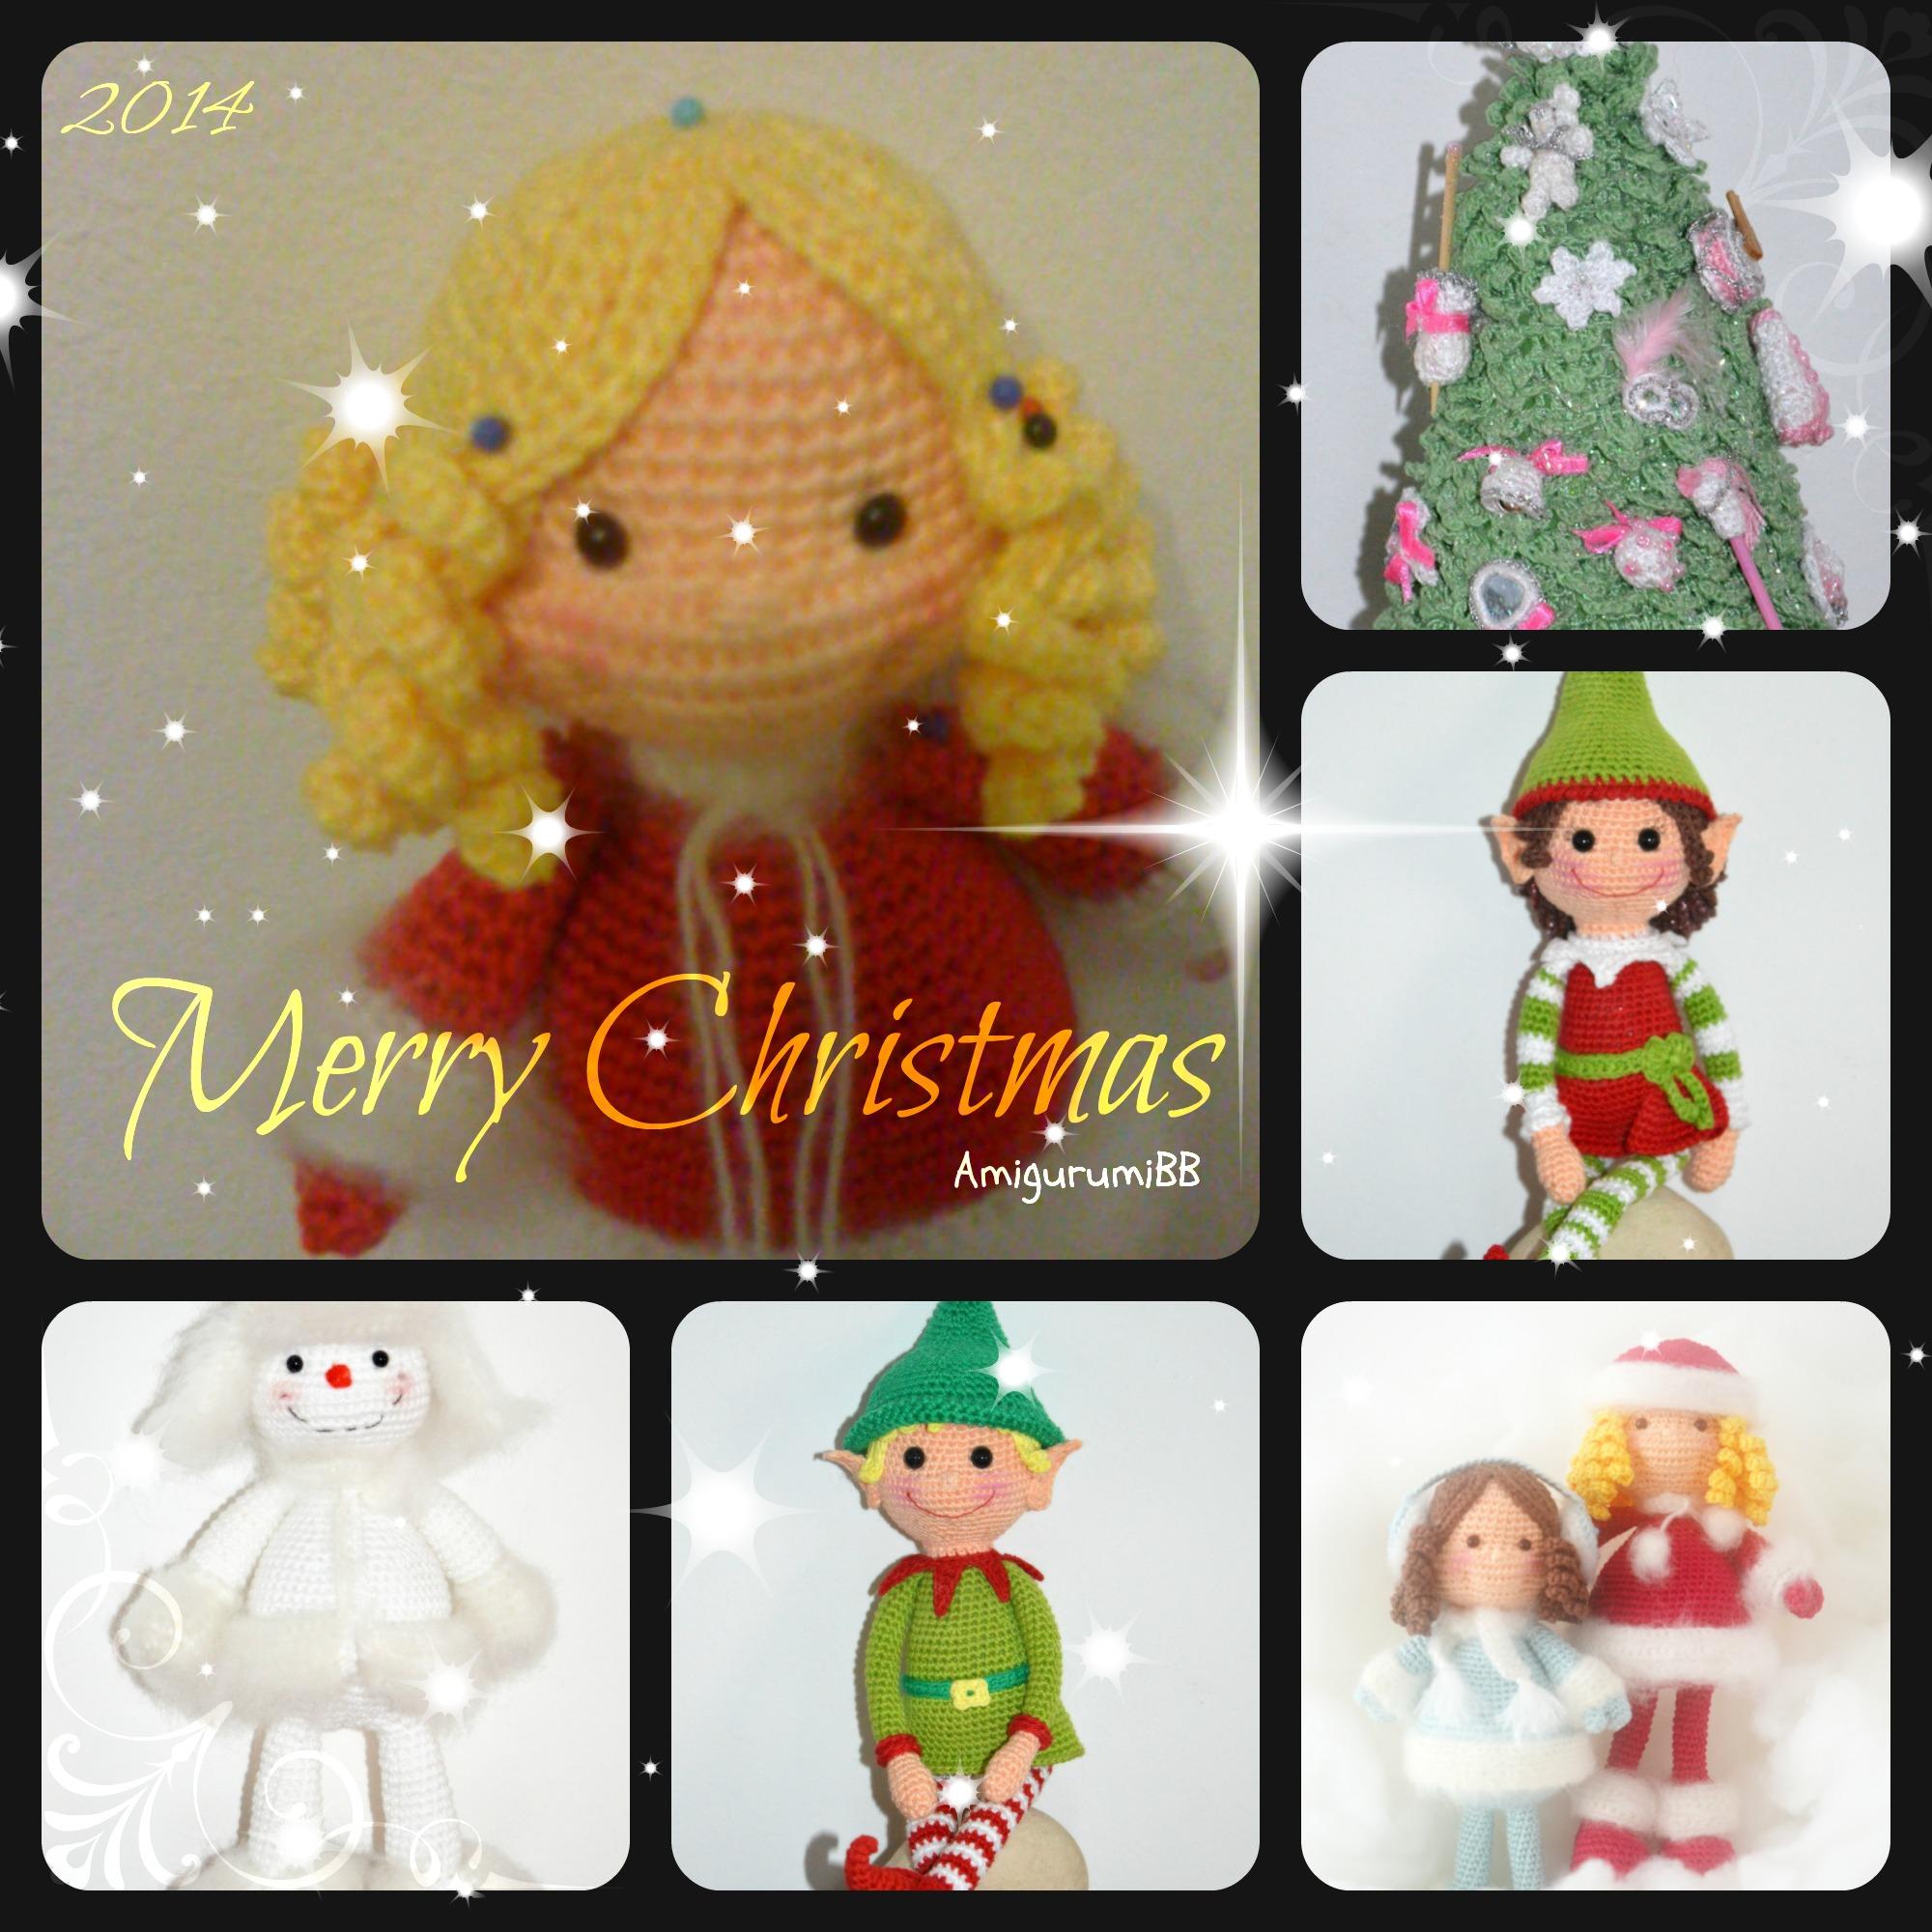 Merry Christmas from AmigurumiBB AmigurumiBBs Blog